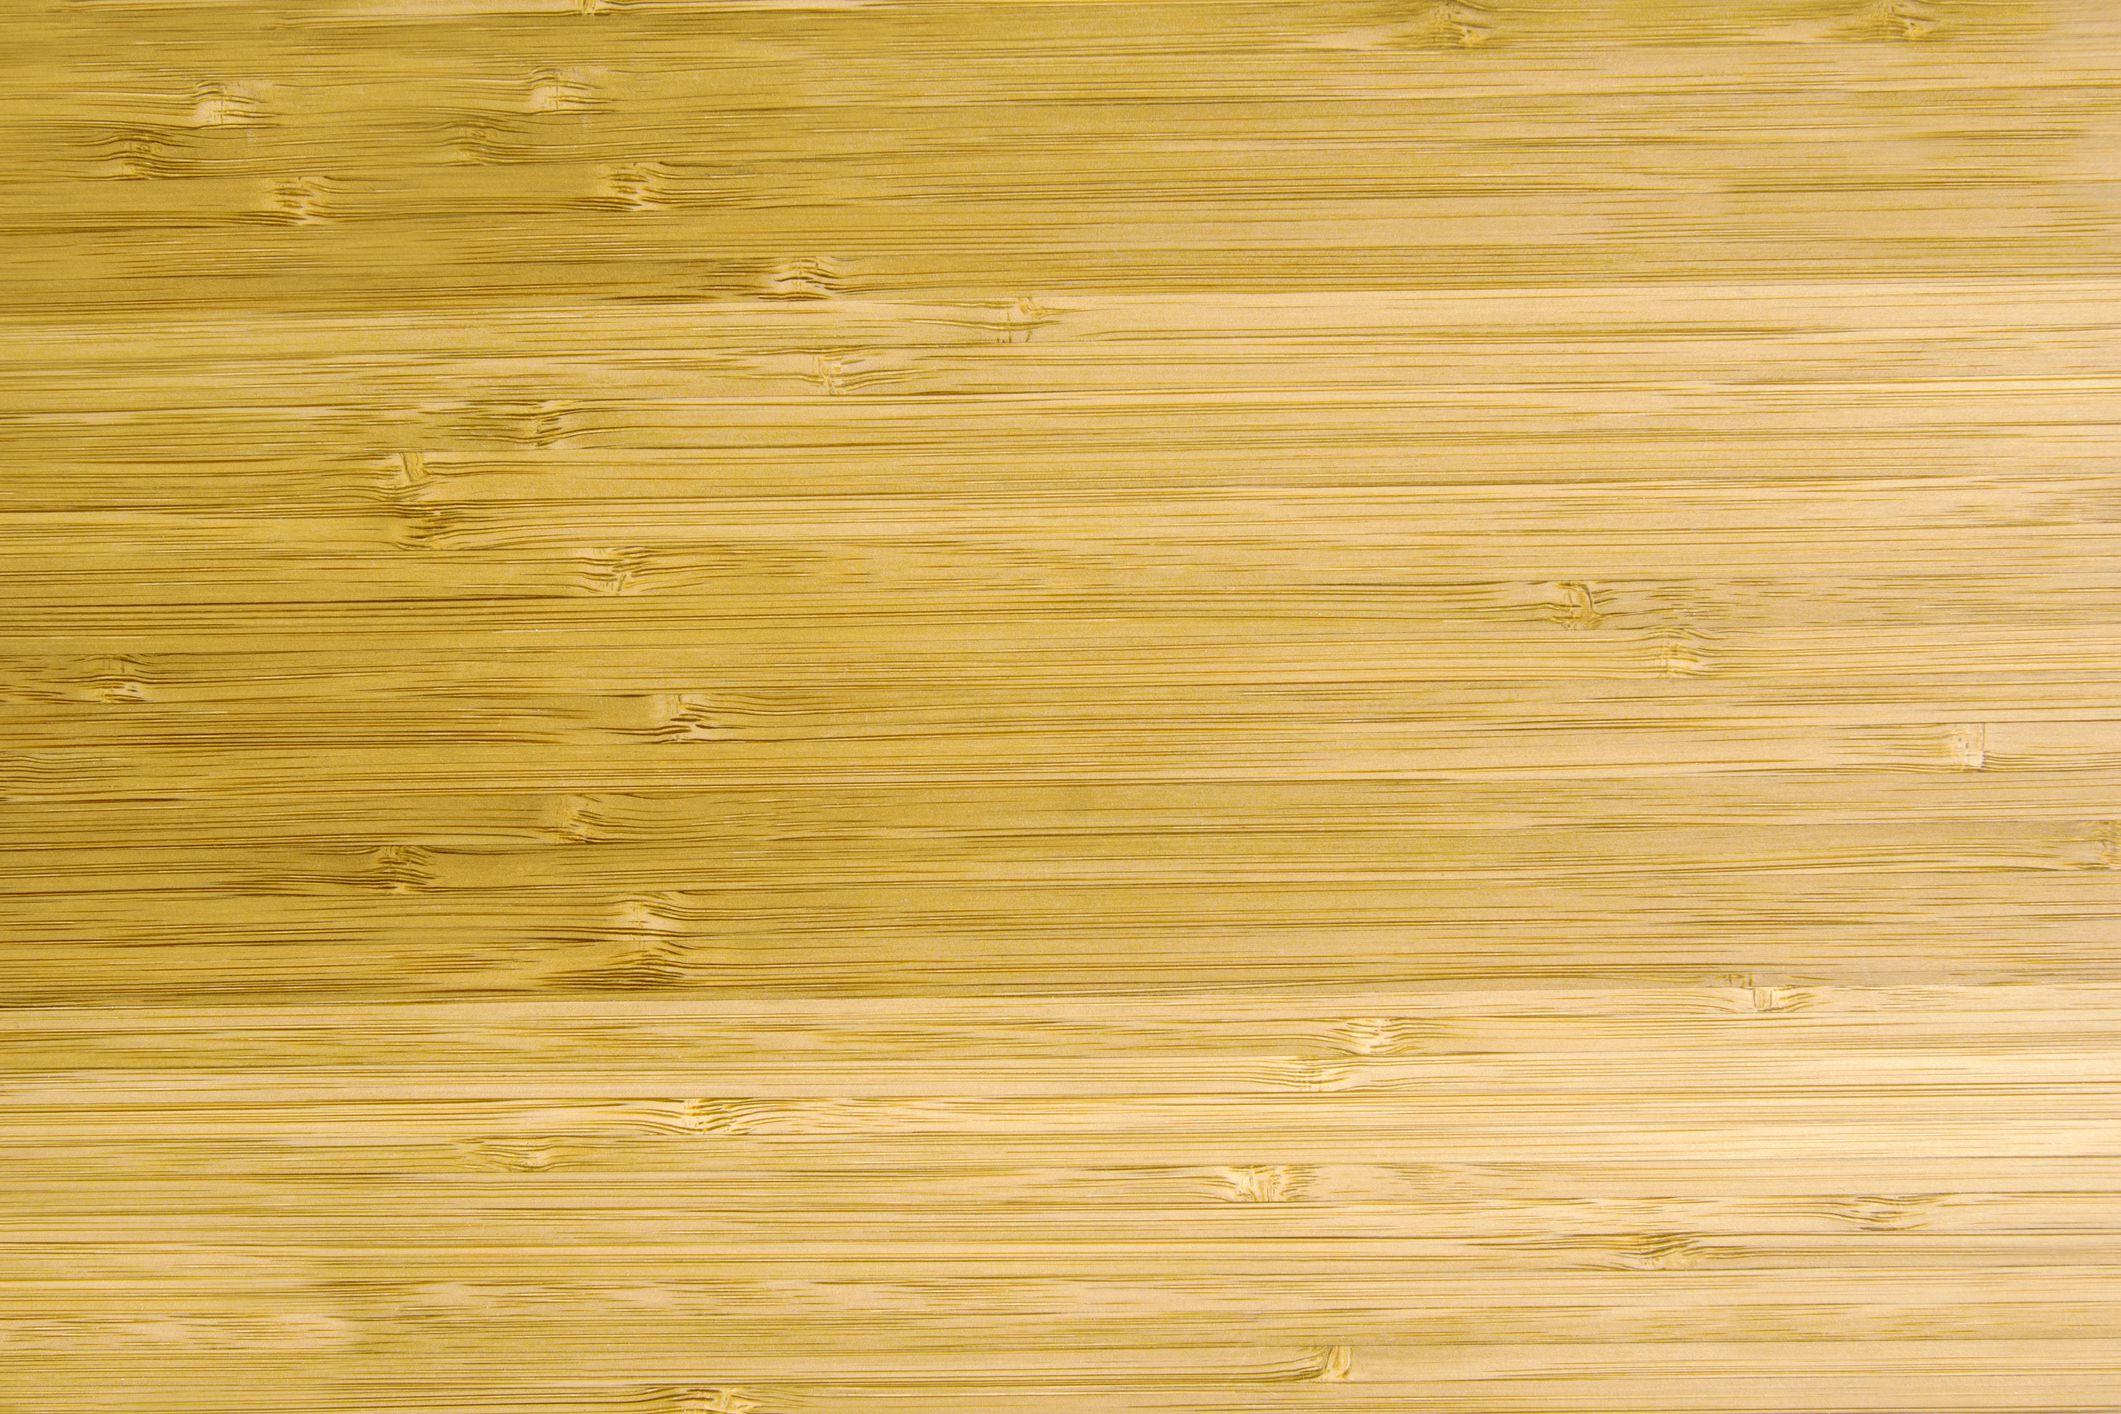 5 Best Types Of Bamboo Flooring